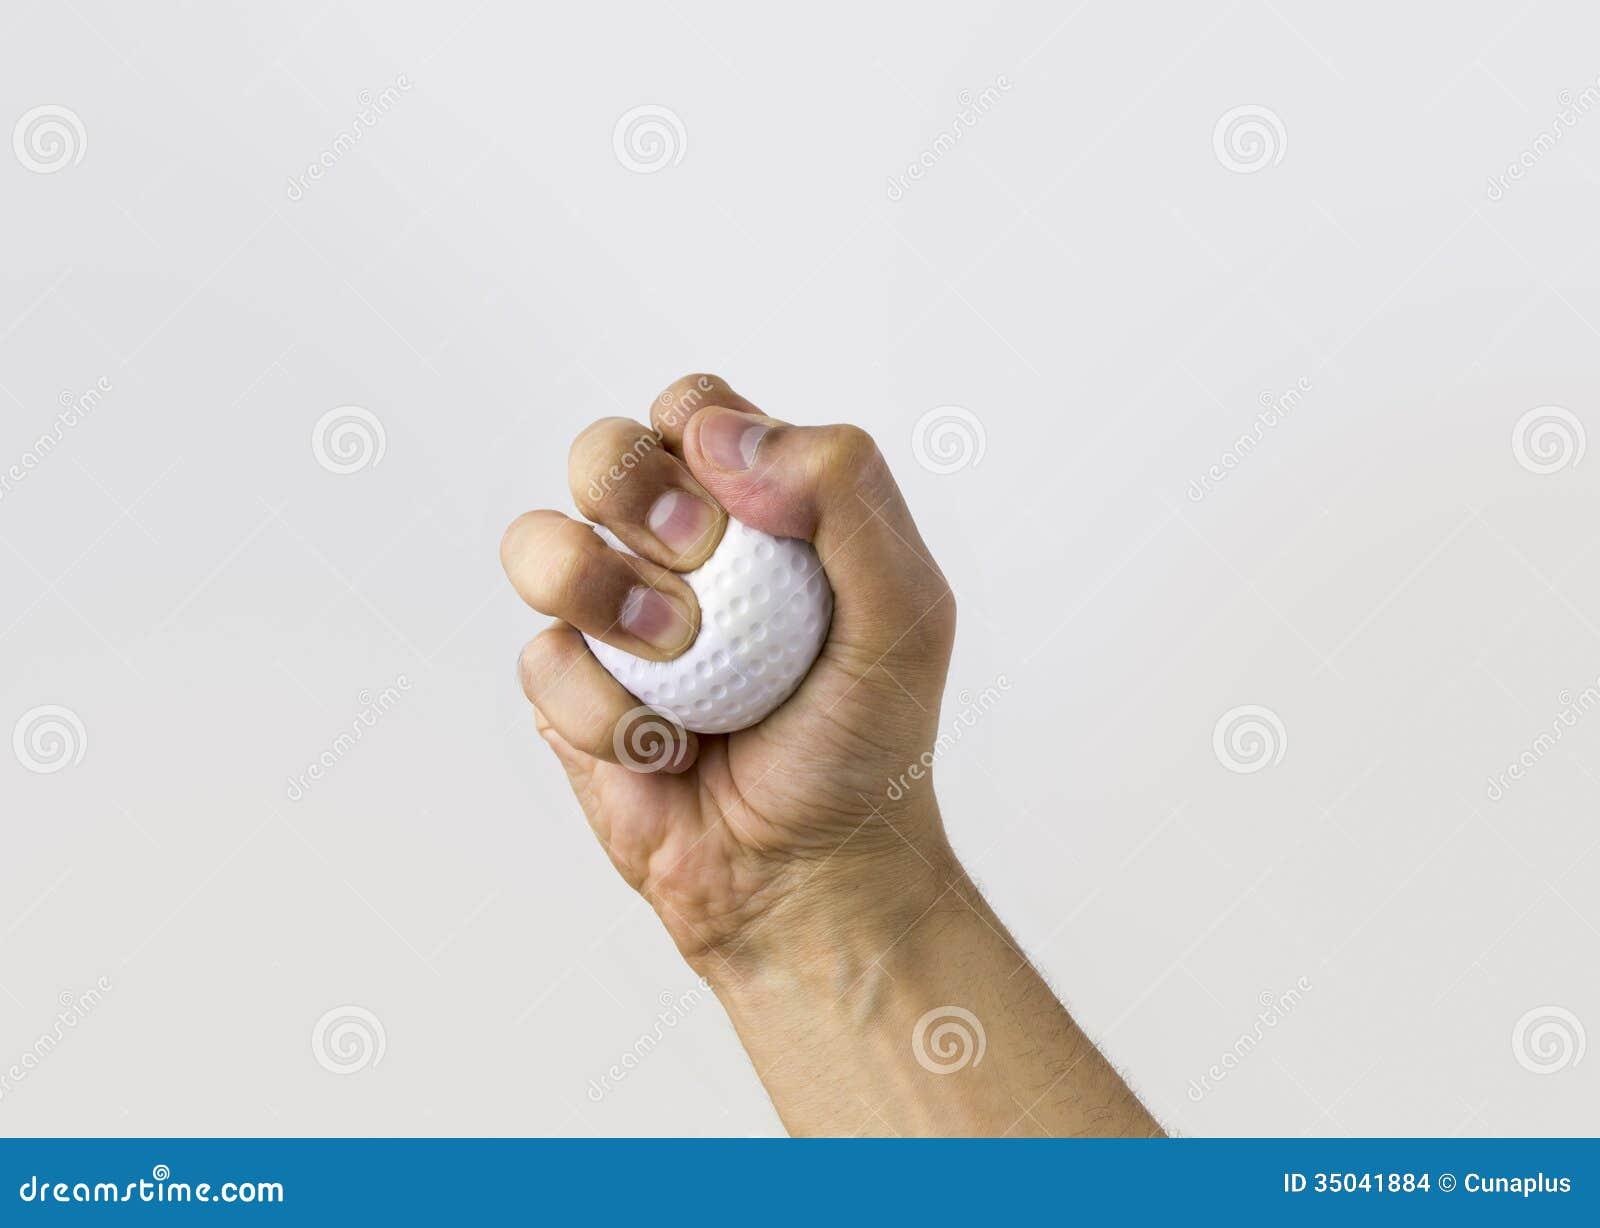 balls squeezed hand jobs